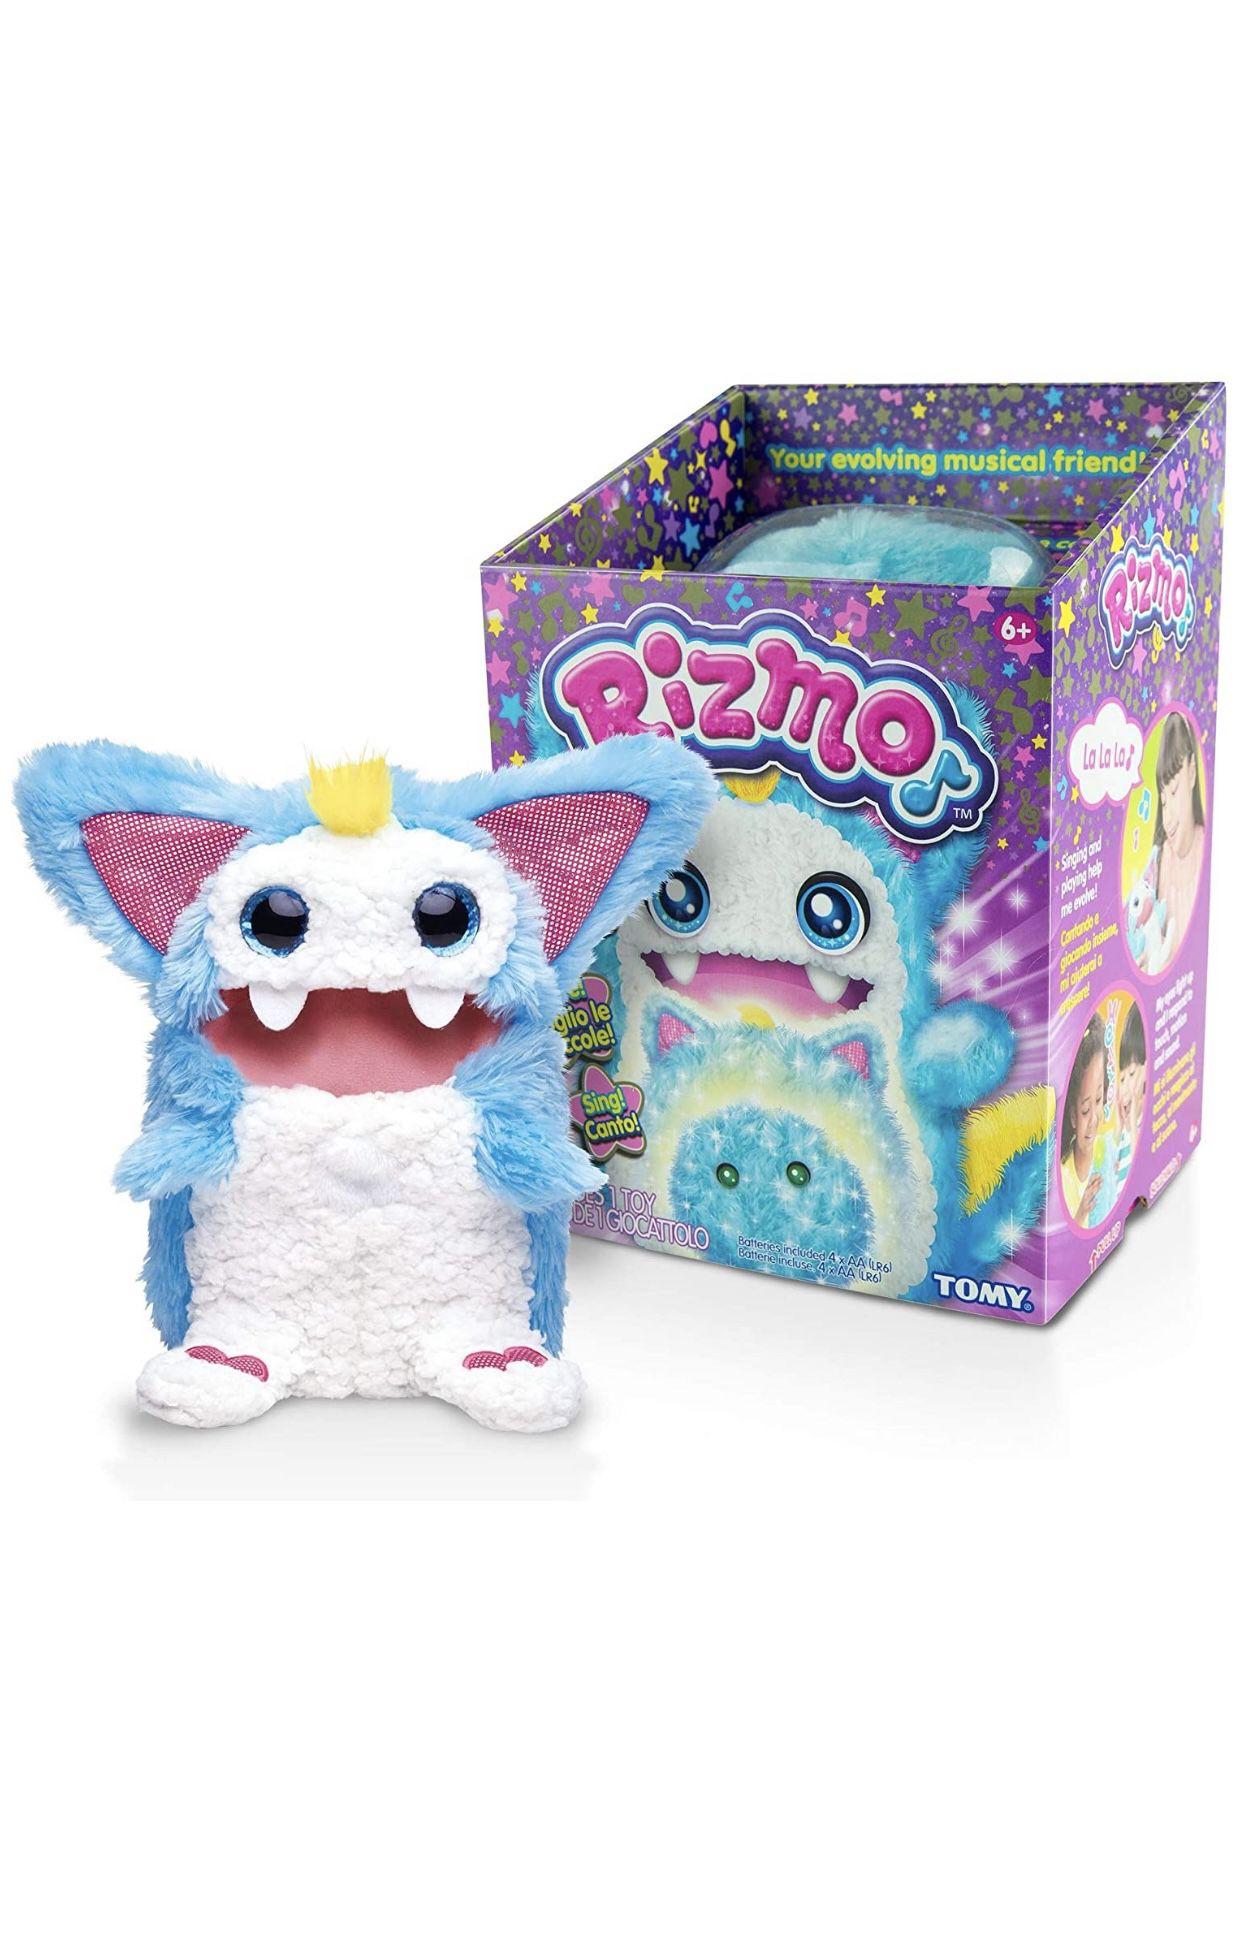 New Rizmo Evolving Musical Friend Interactive Plush Toy with Fun Games, Aqua